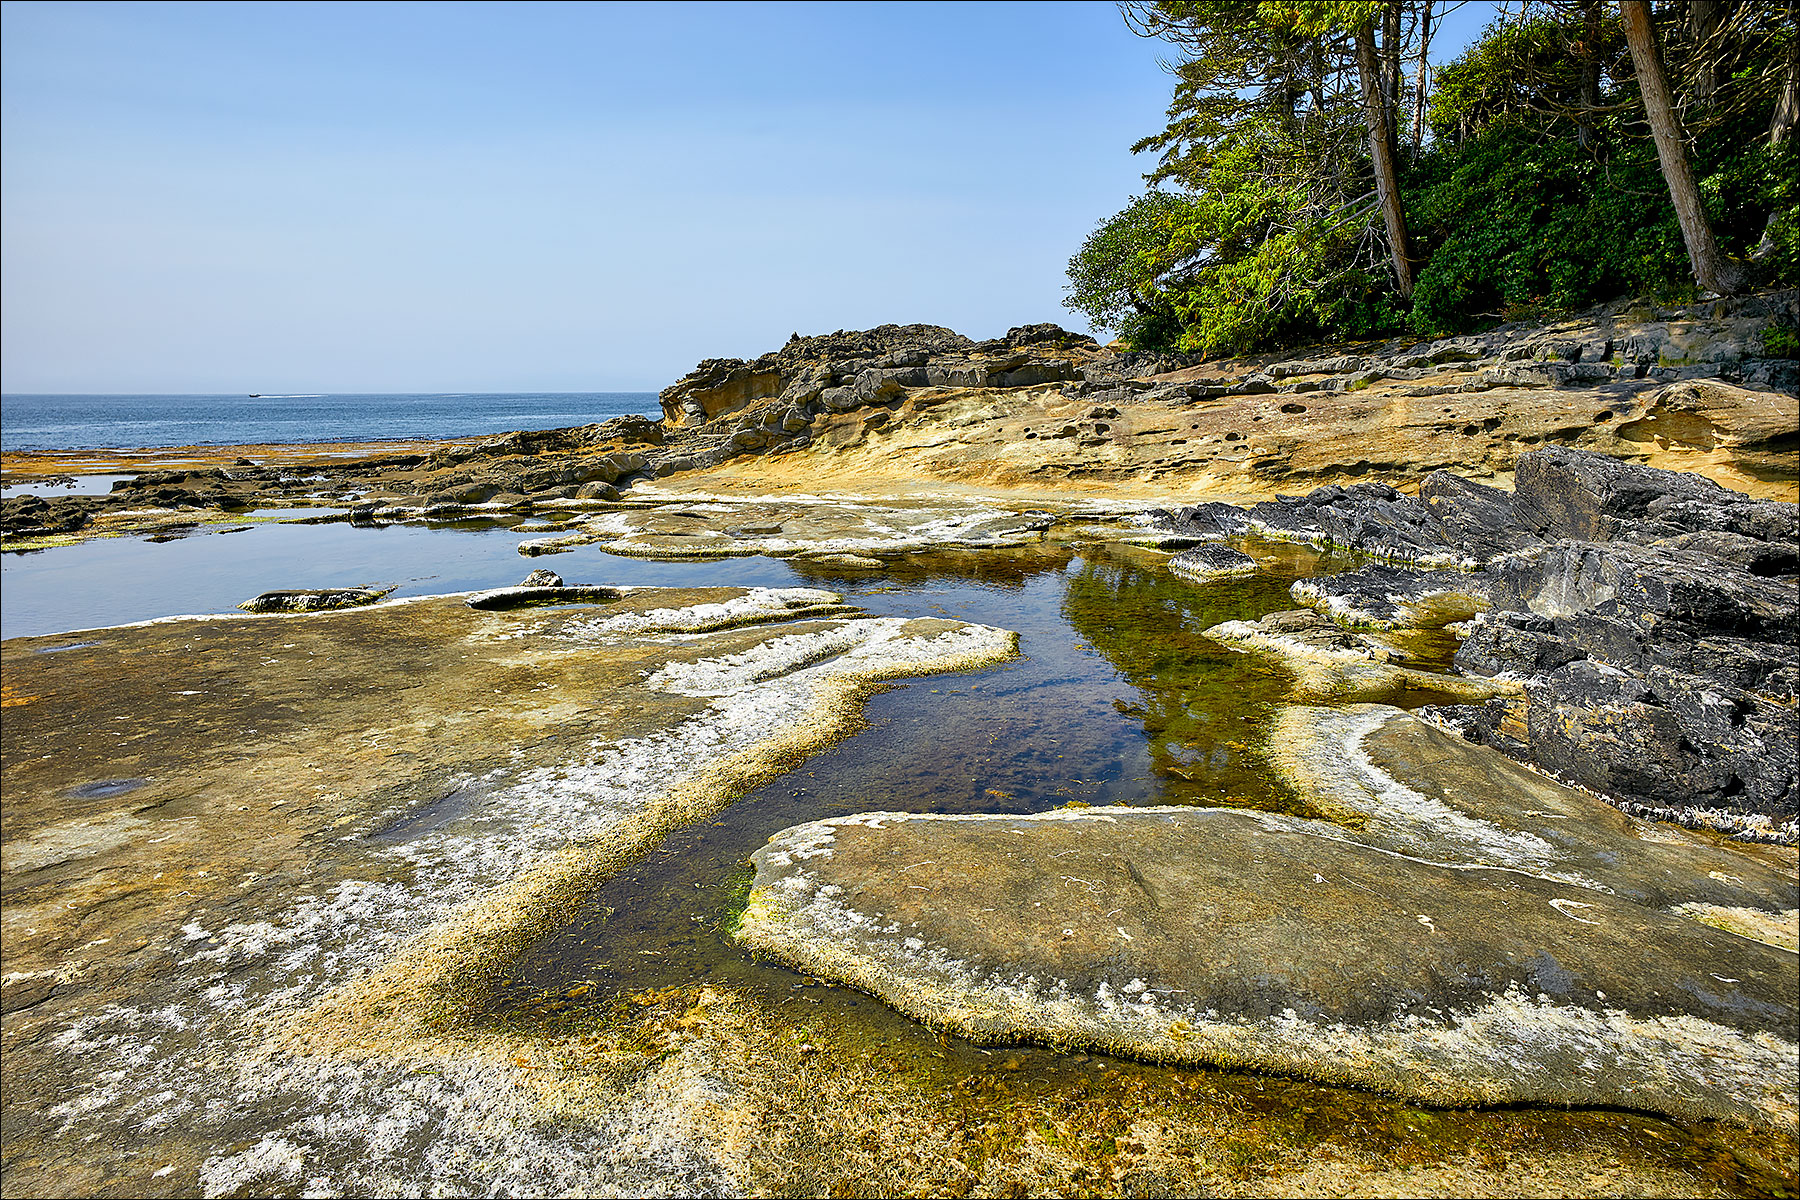 Tom Baird beach on the Juan de Fuca Marine Trail ©johncameron.ca